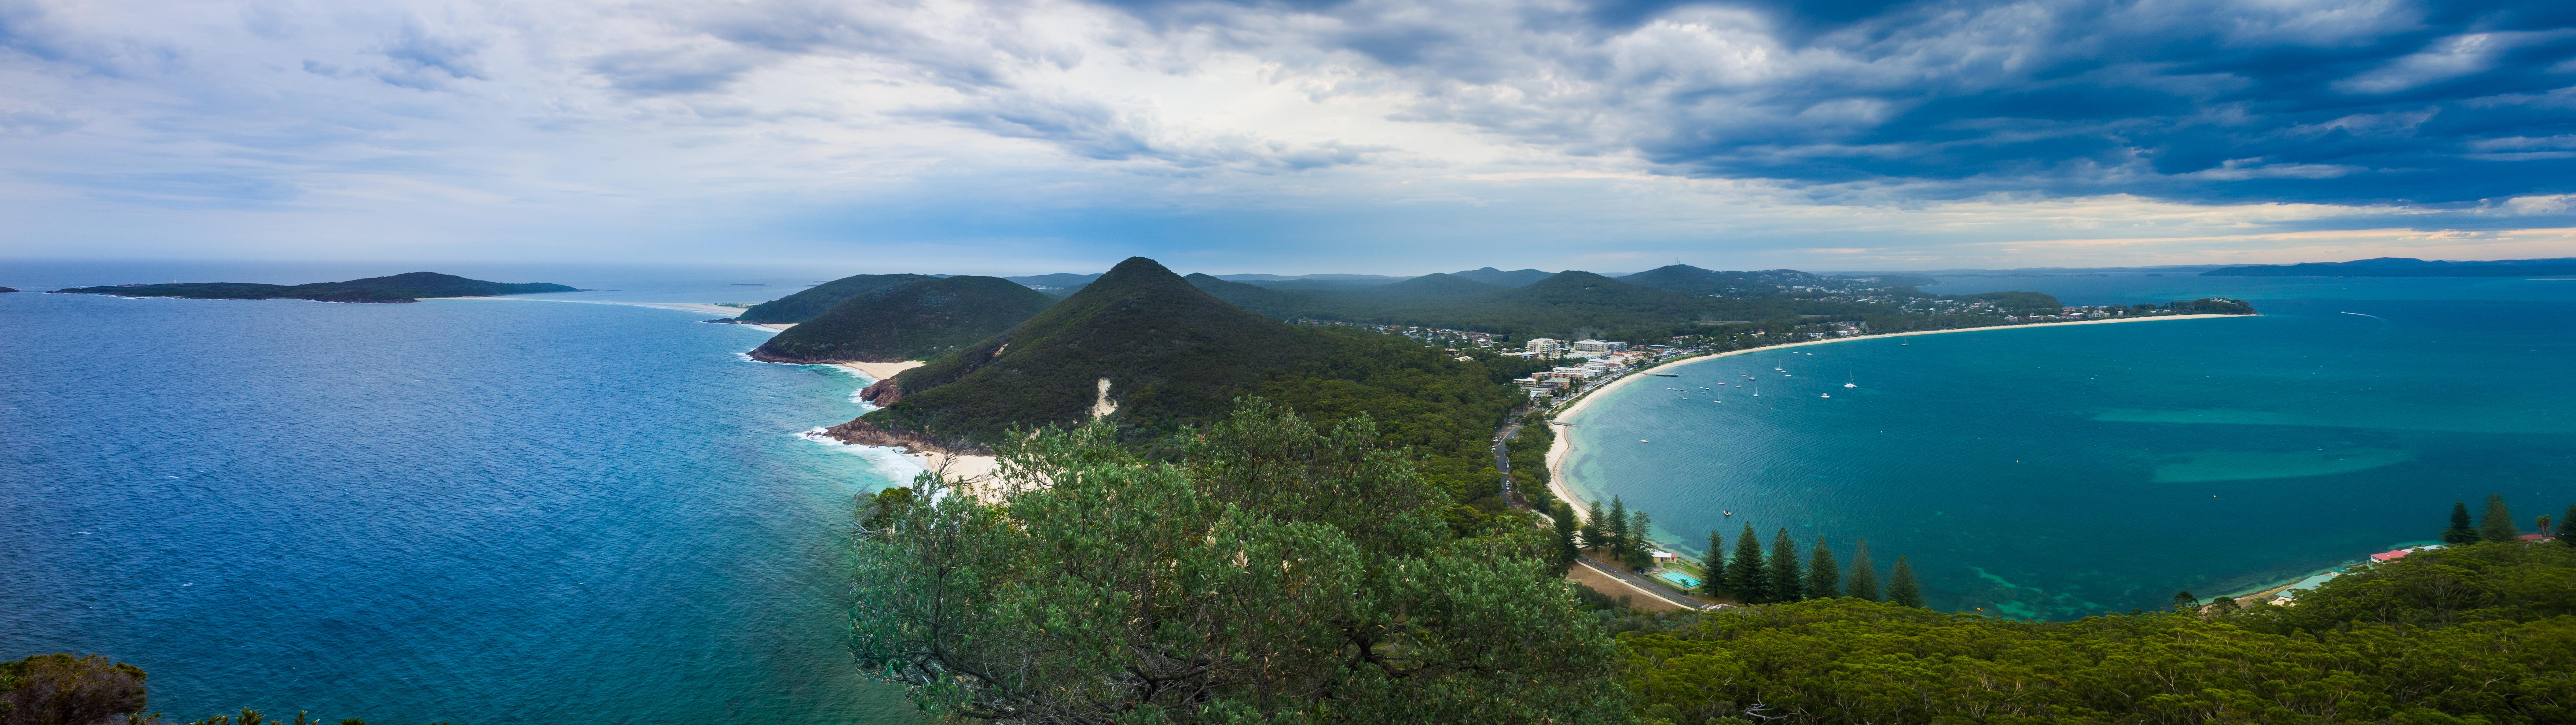 General 8430x2371 panorama landscape dual display dual monitors beach peninsula tomaree national park